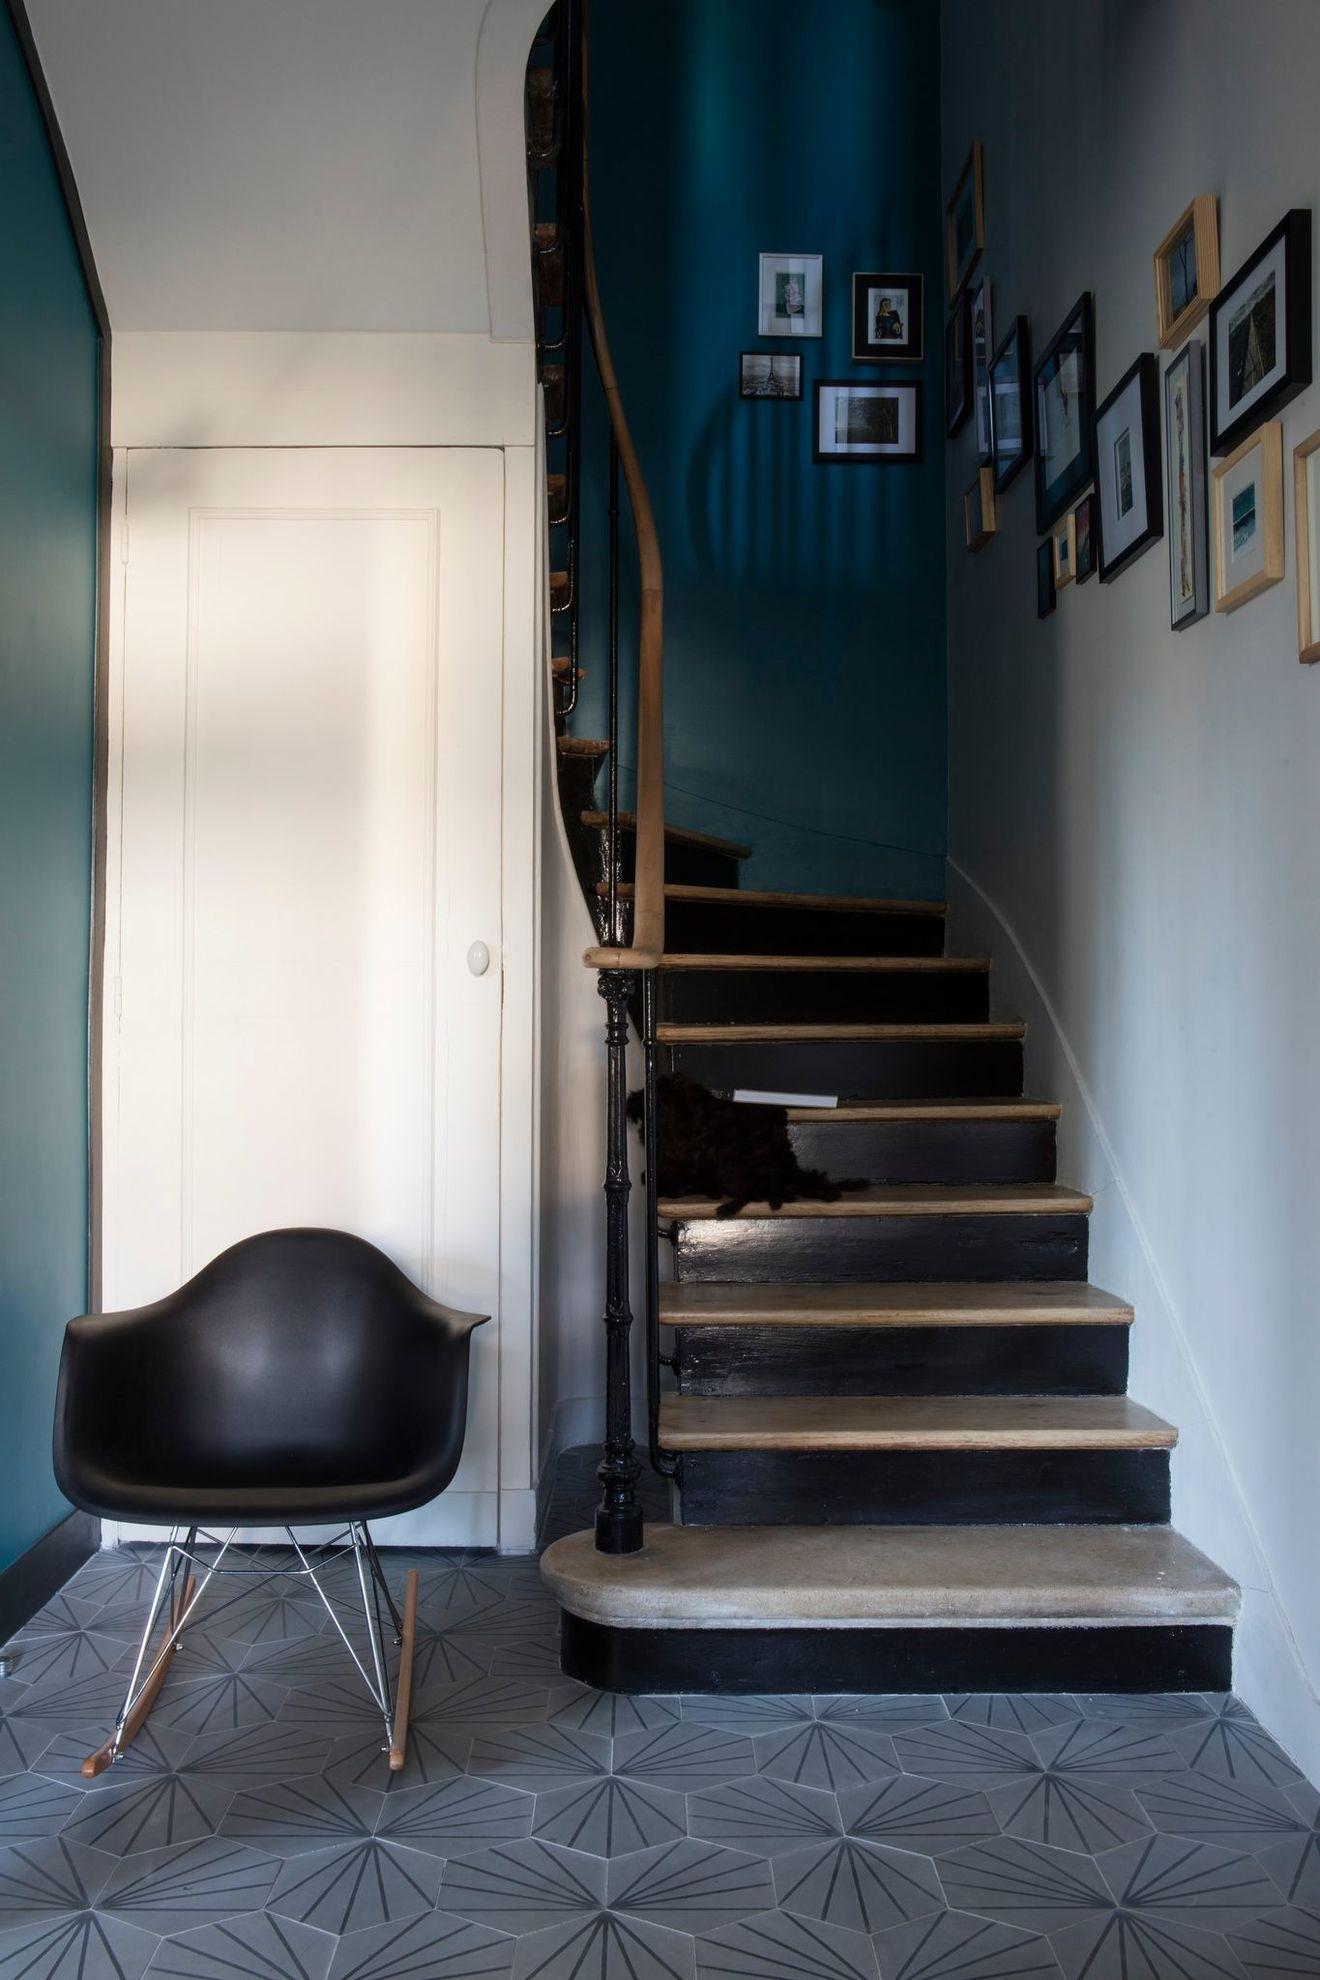 100 Remarquable Suggestions Deco Cage D Escalier Design